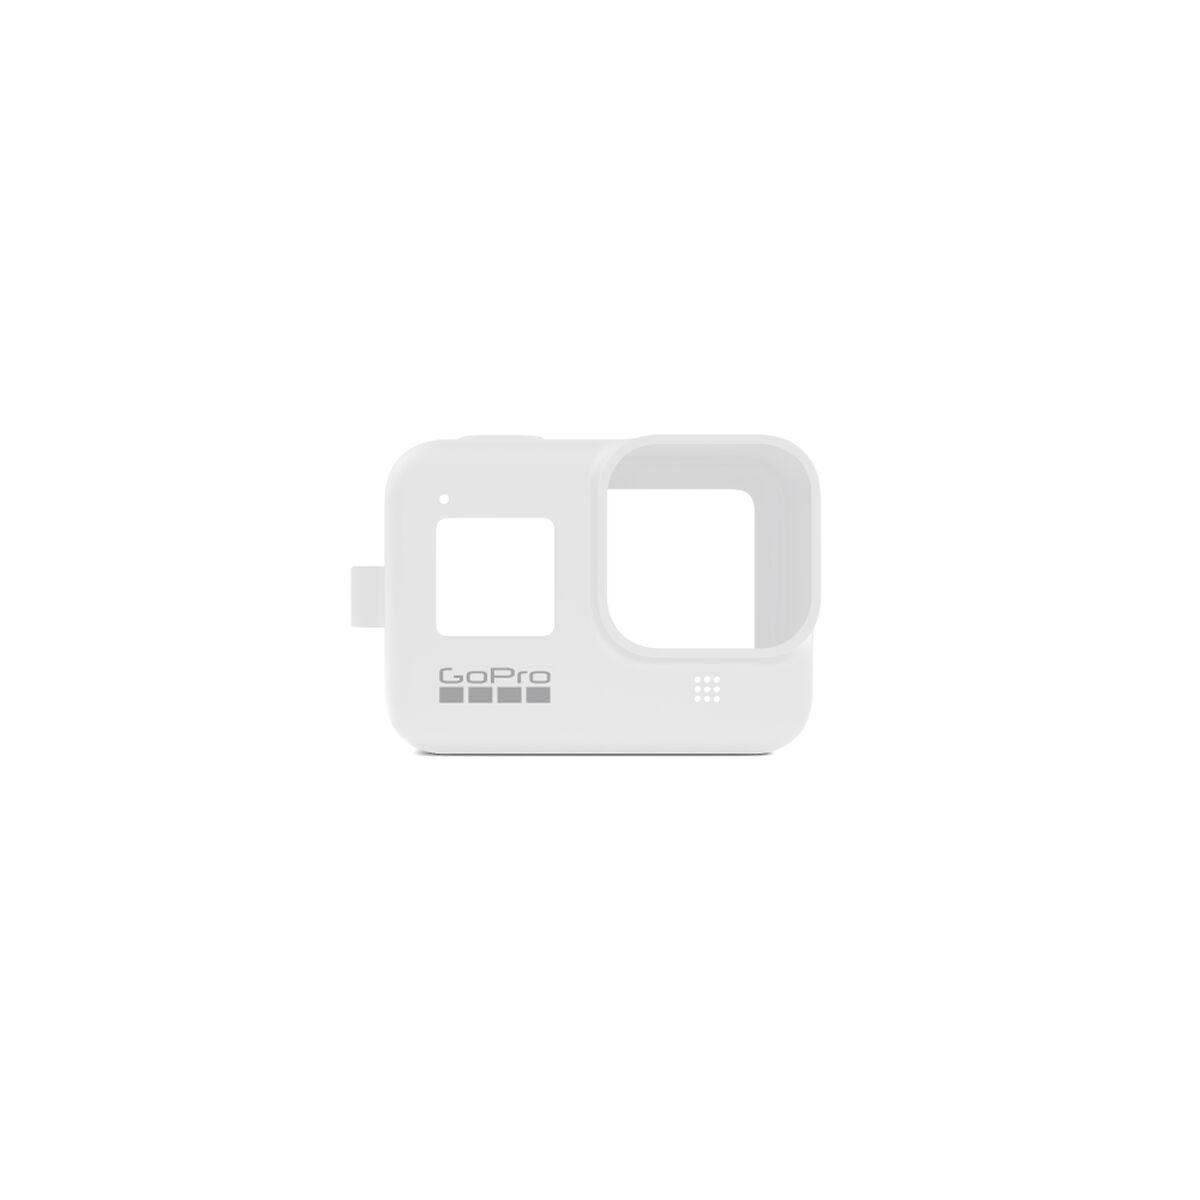 Funda de Silicona + Cordón Blanco para GoPro HERO8